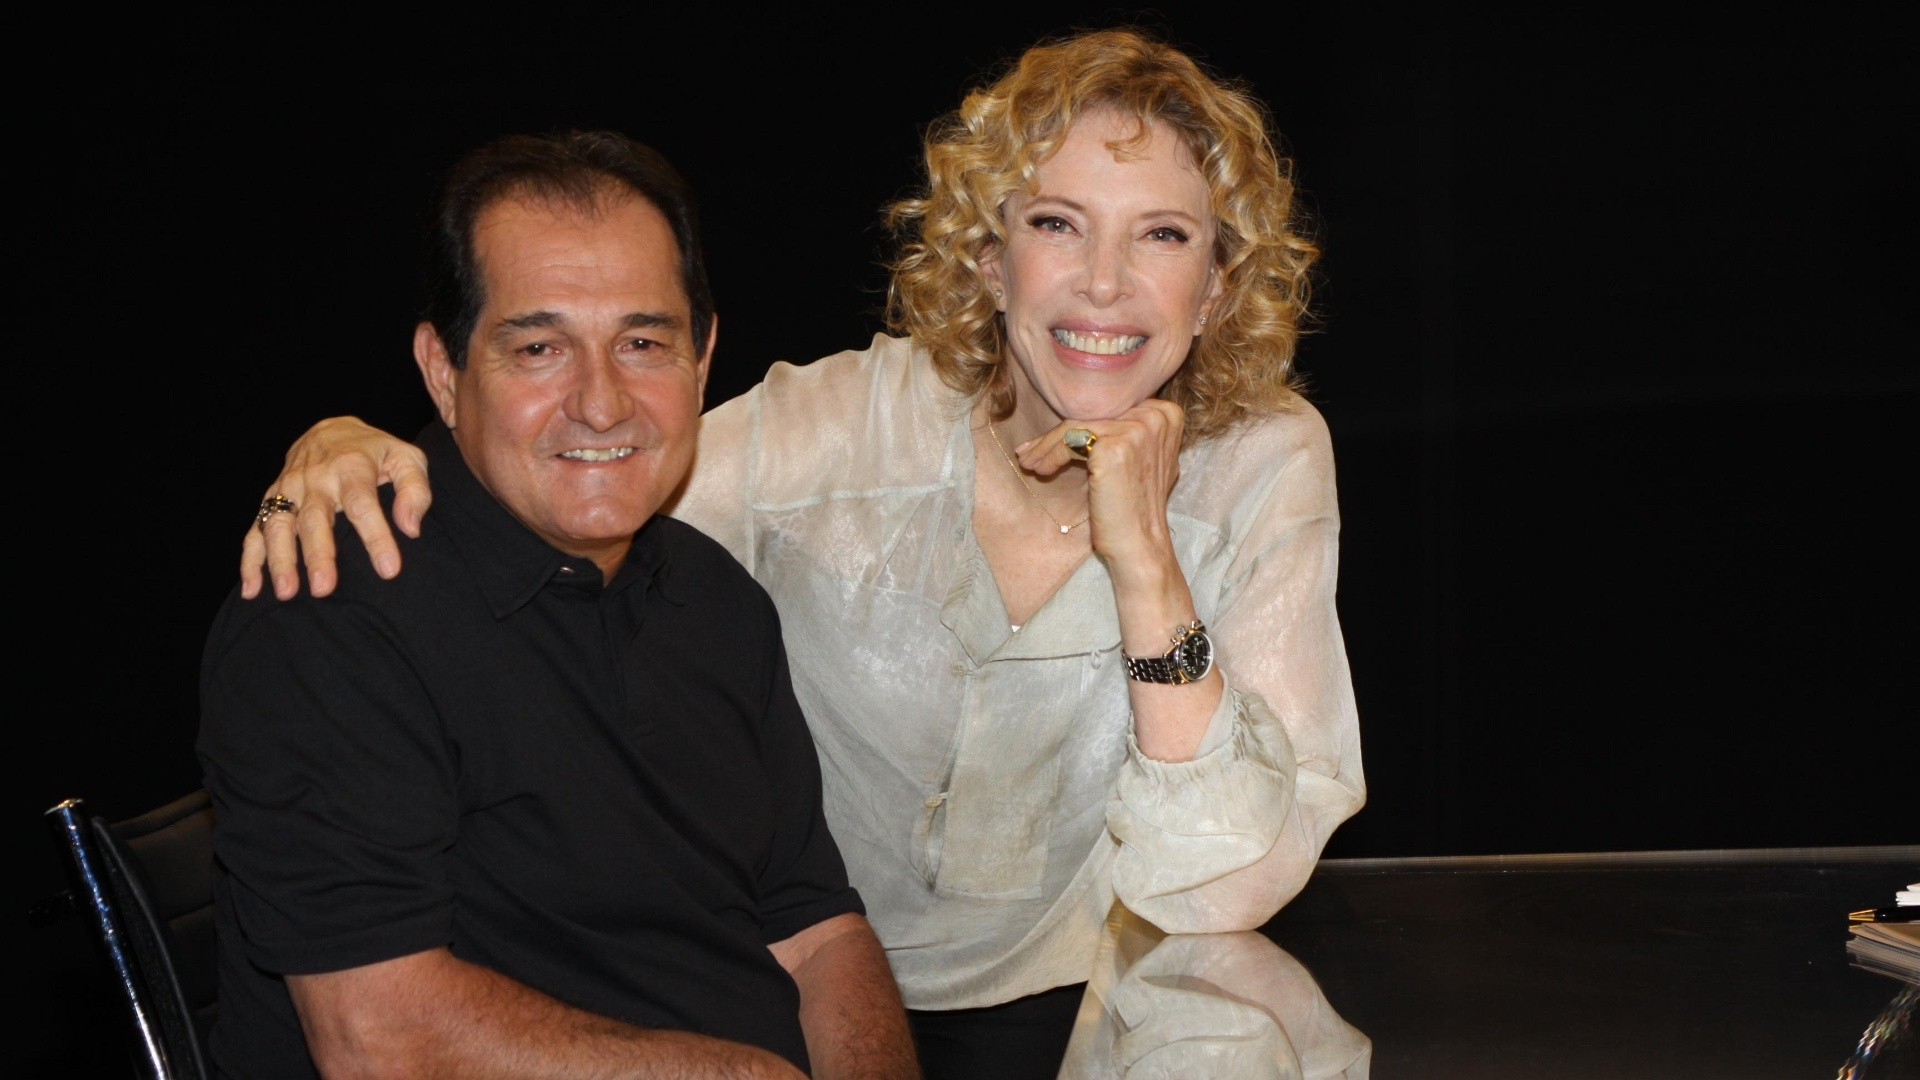 Marília Gabriela entrevista o técnico Muricy Ramalho (22/7/2012)